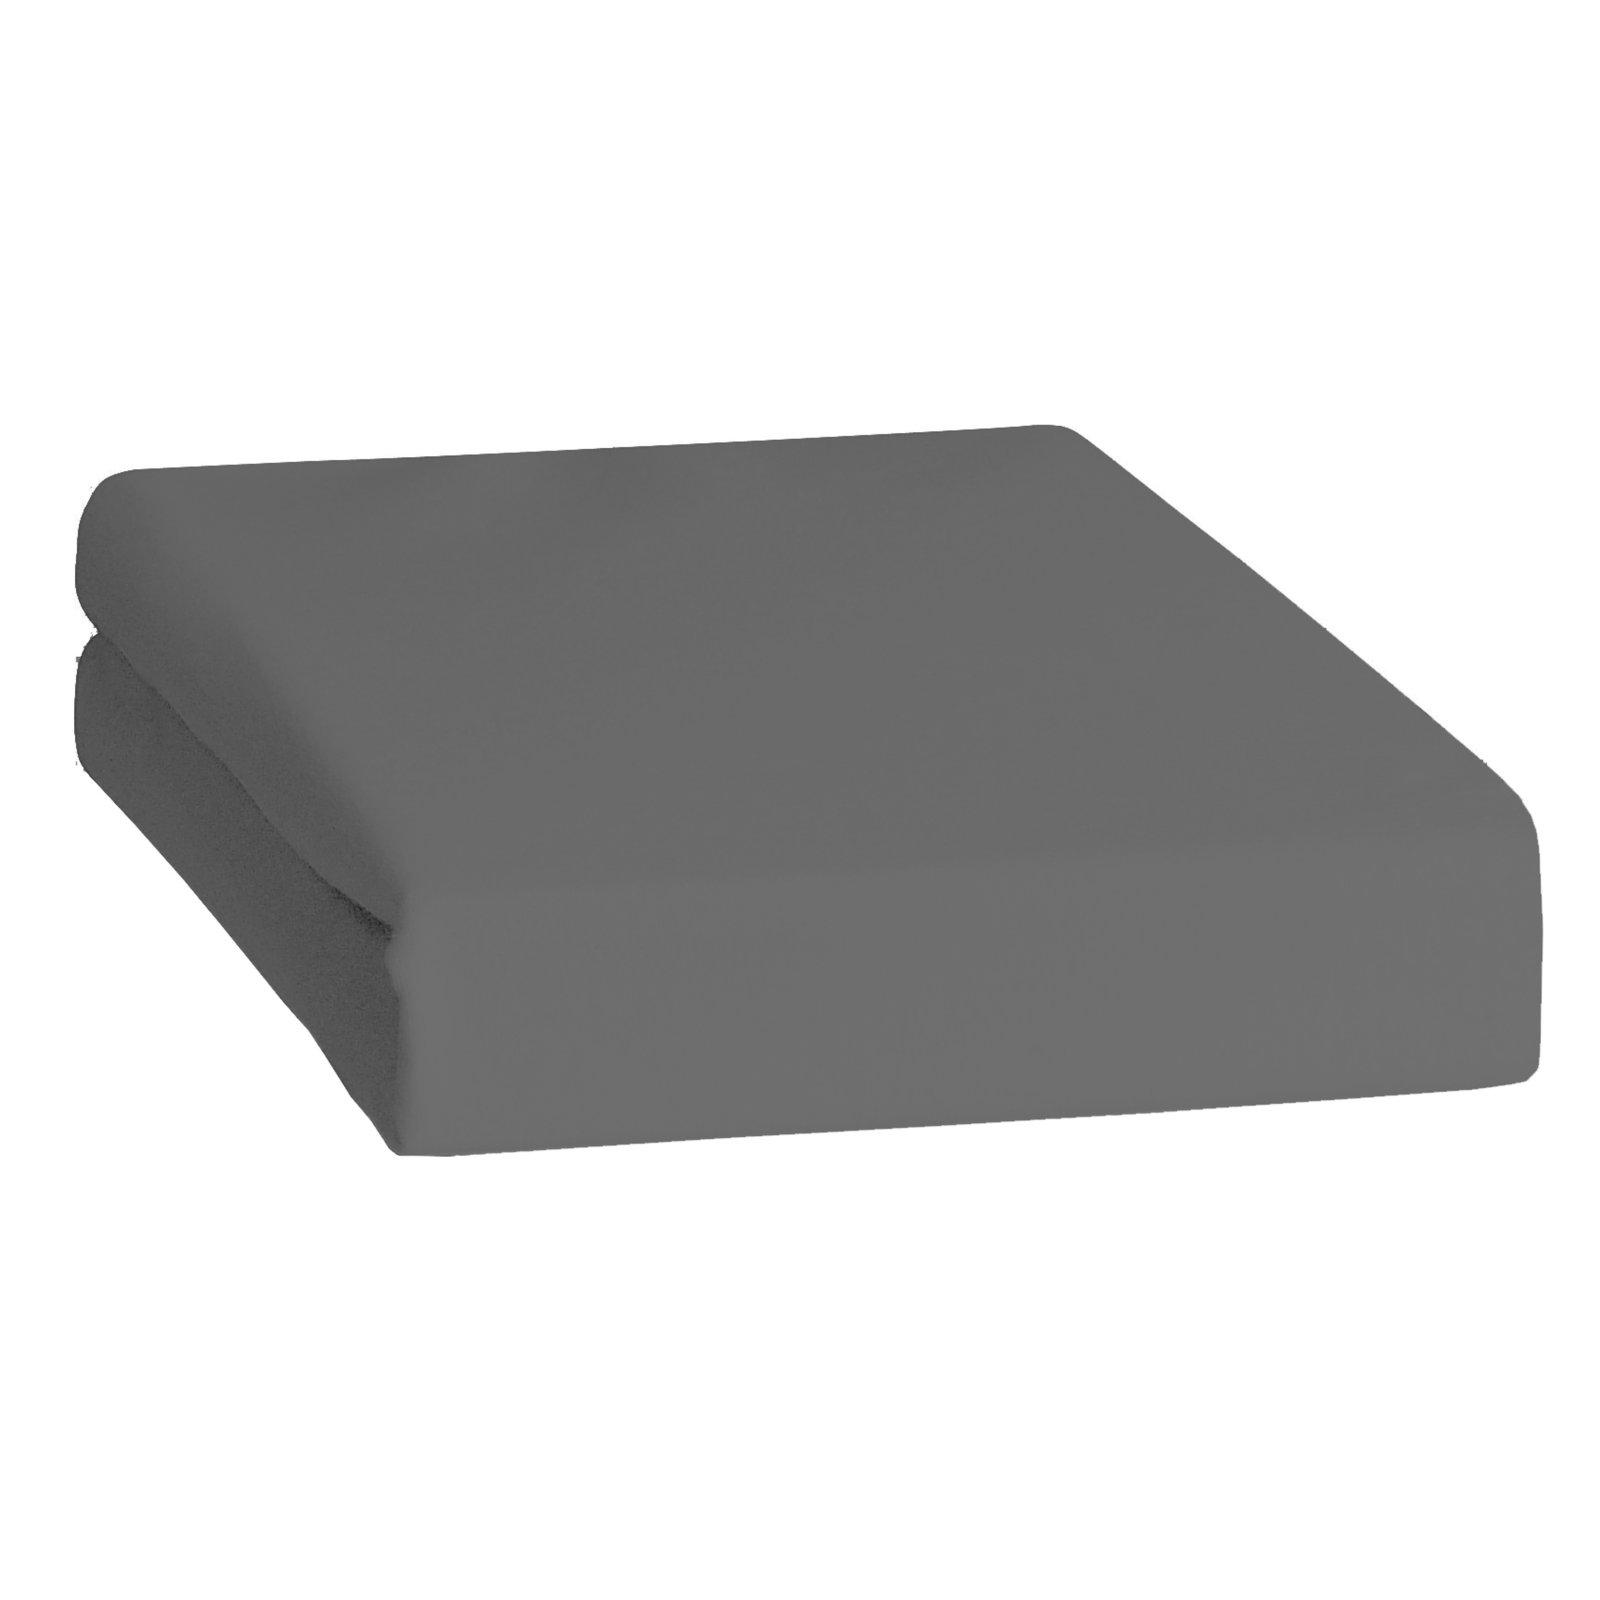 feinbiber spannbettlaken anthrazit 100x200 cm bettlaken bettw sche bettlaken. Black Bedroom Furniture Sets. Home Design Ideas